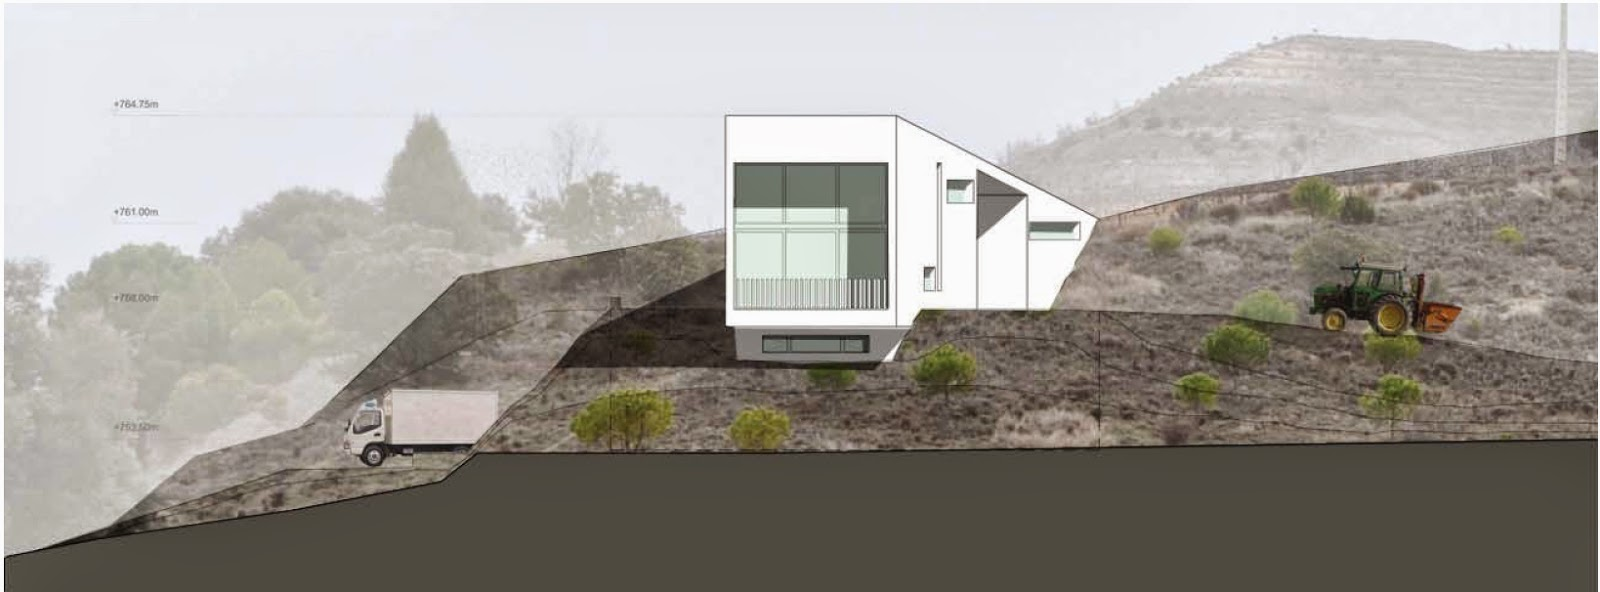 Arquitectura arquidea proyecto de bodega valdemonjas for Proyectos arquitectura